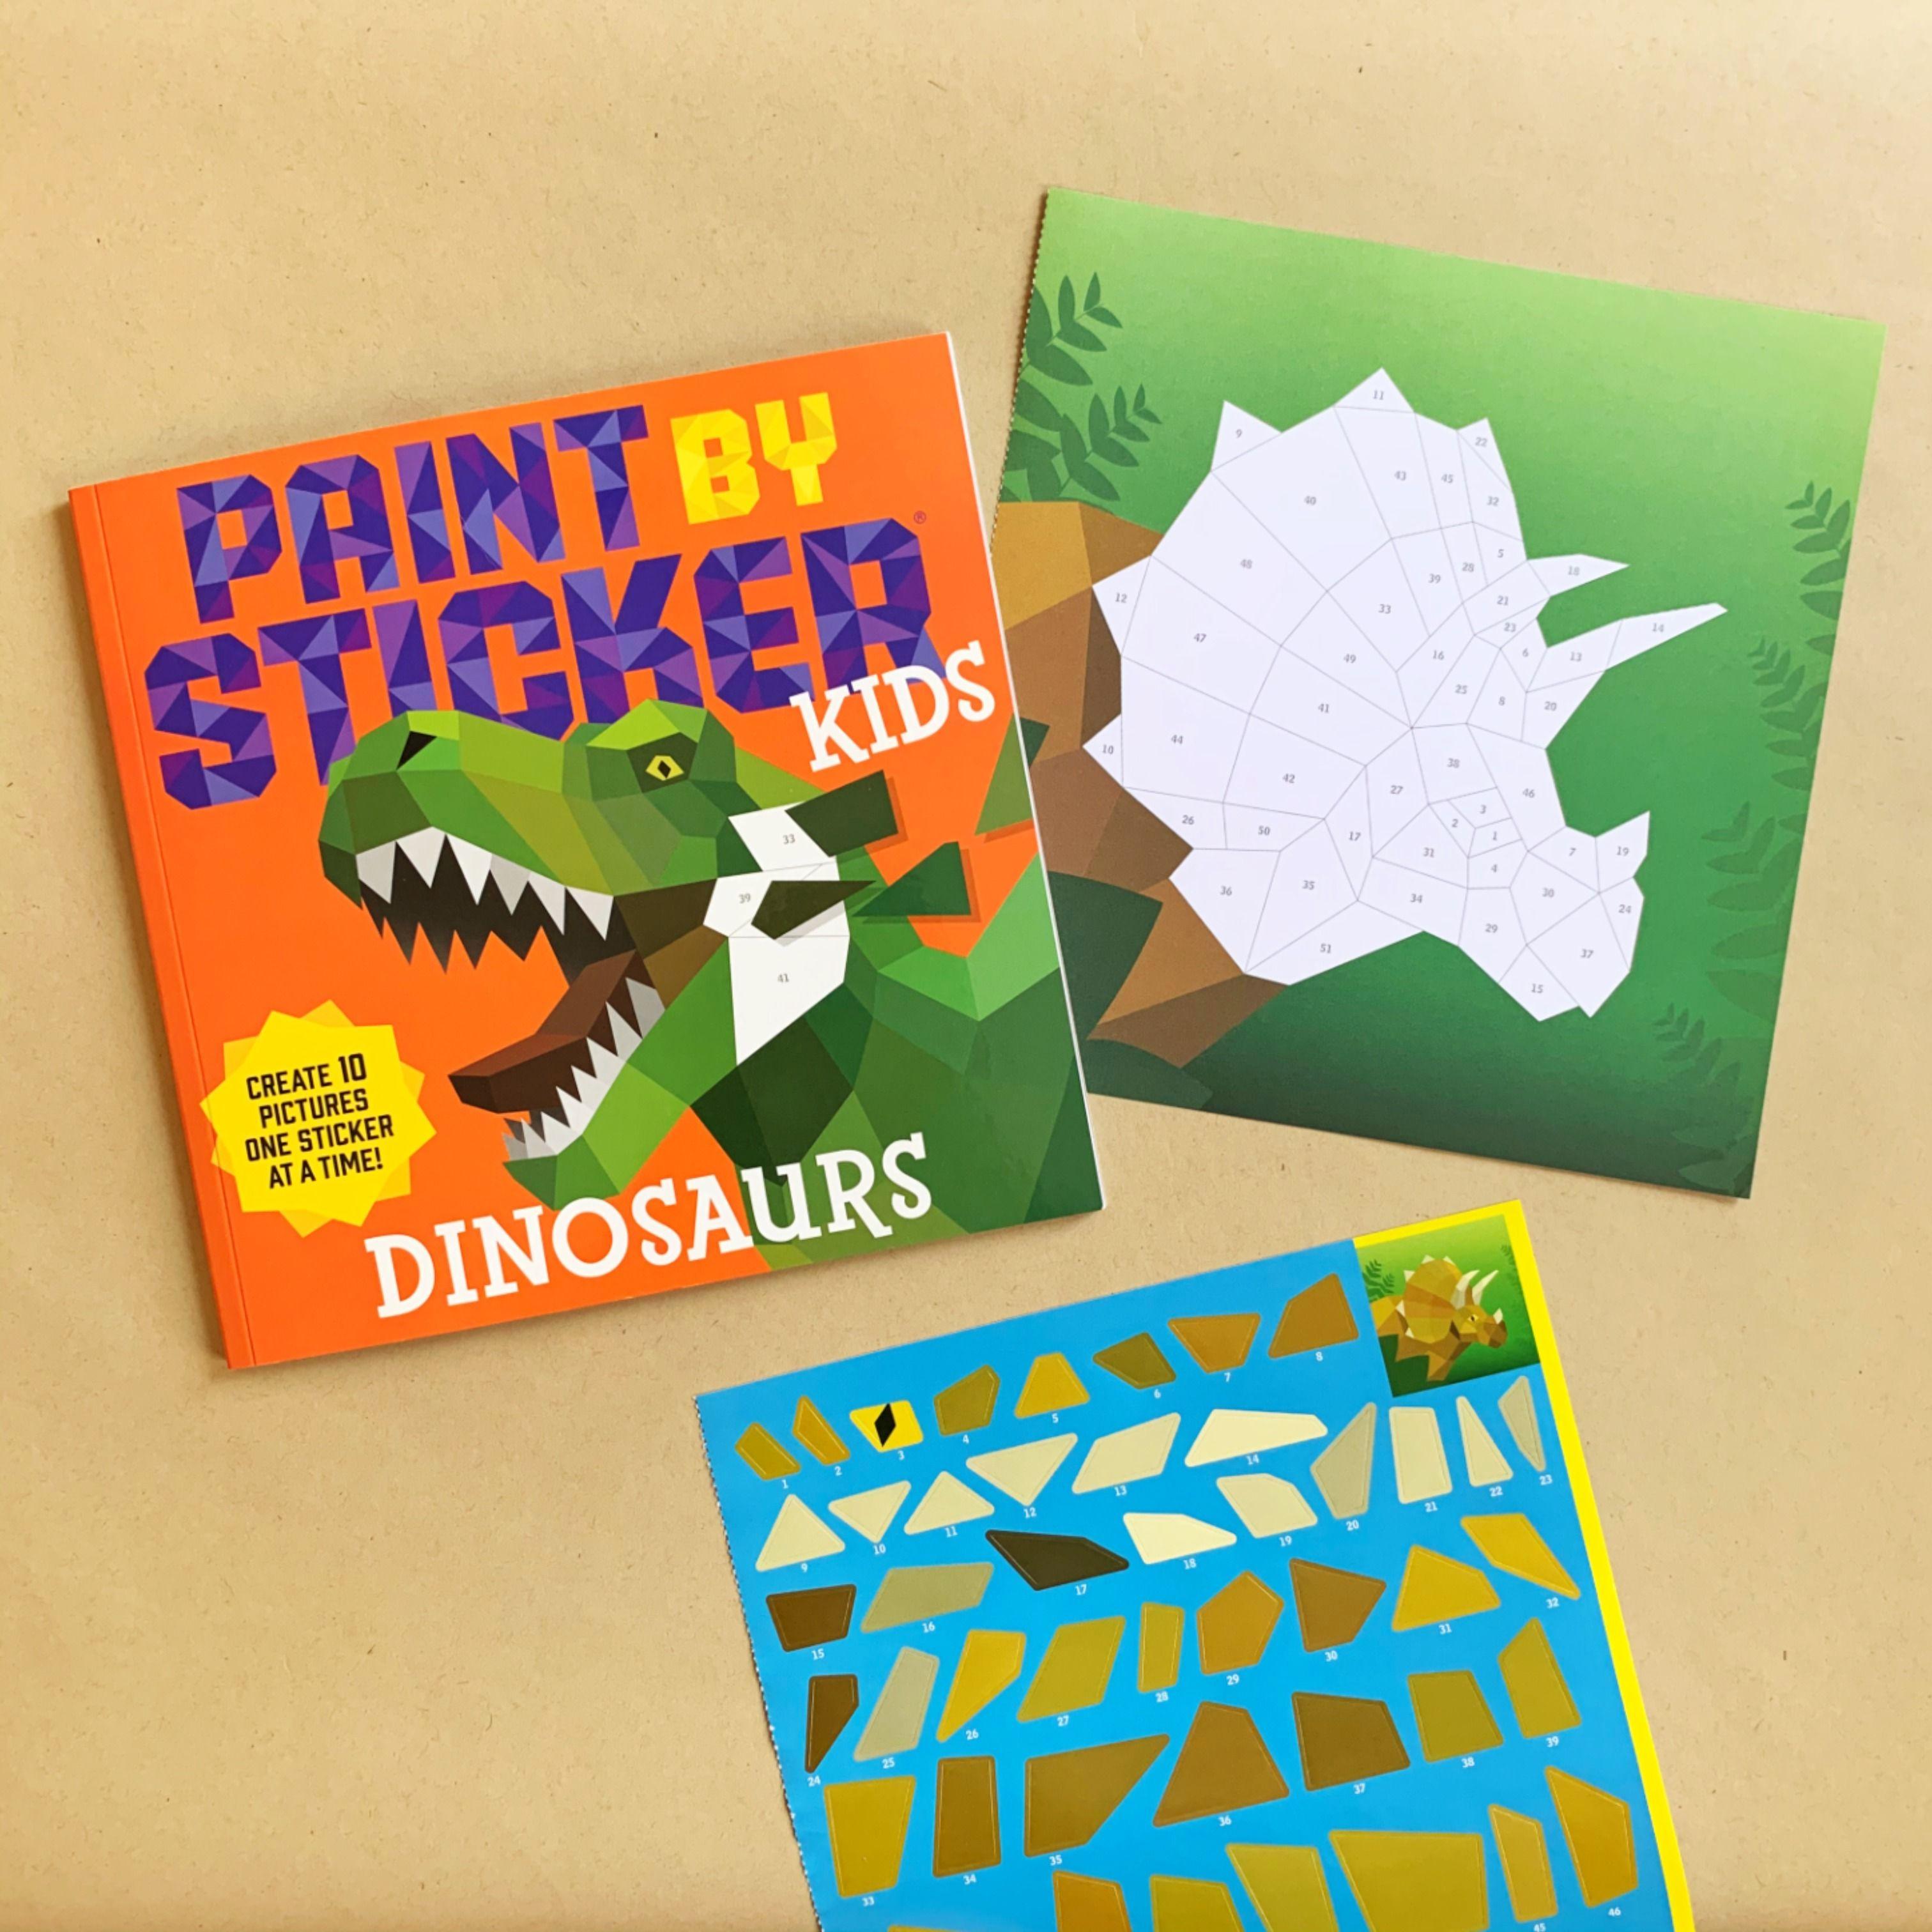 Paint By Sticker Kids Dinosaurs Kids Stickers Dinosaur Kids Dinosaur [ 3024 x 3024 Pixel ]